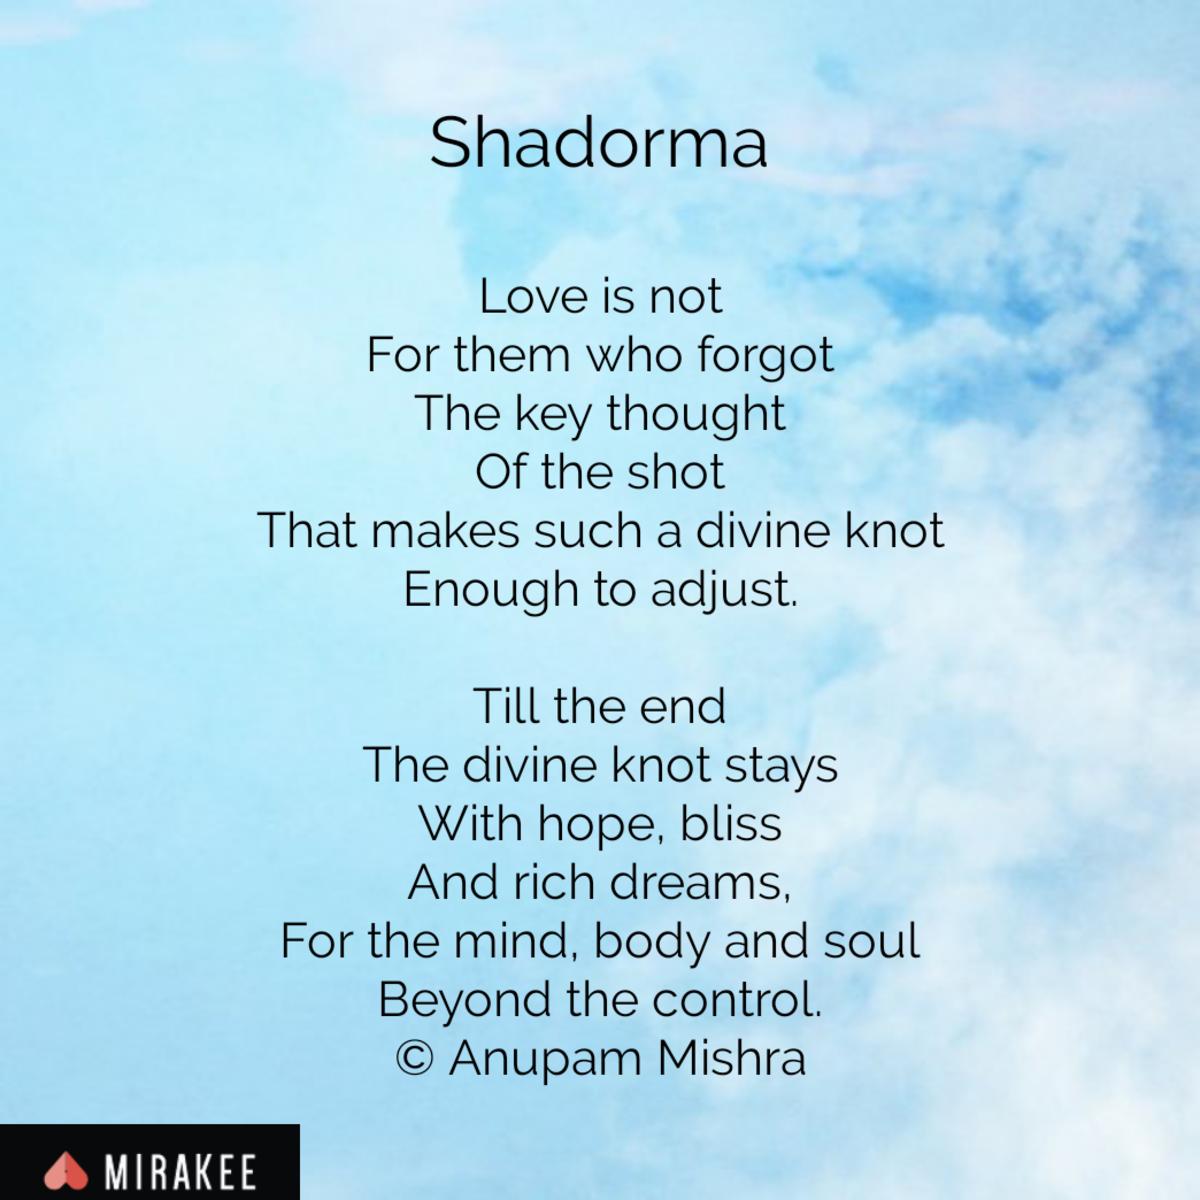 Shadorma